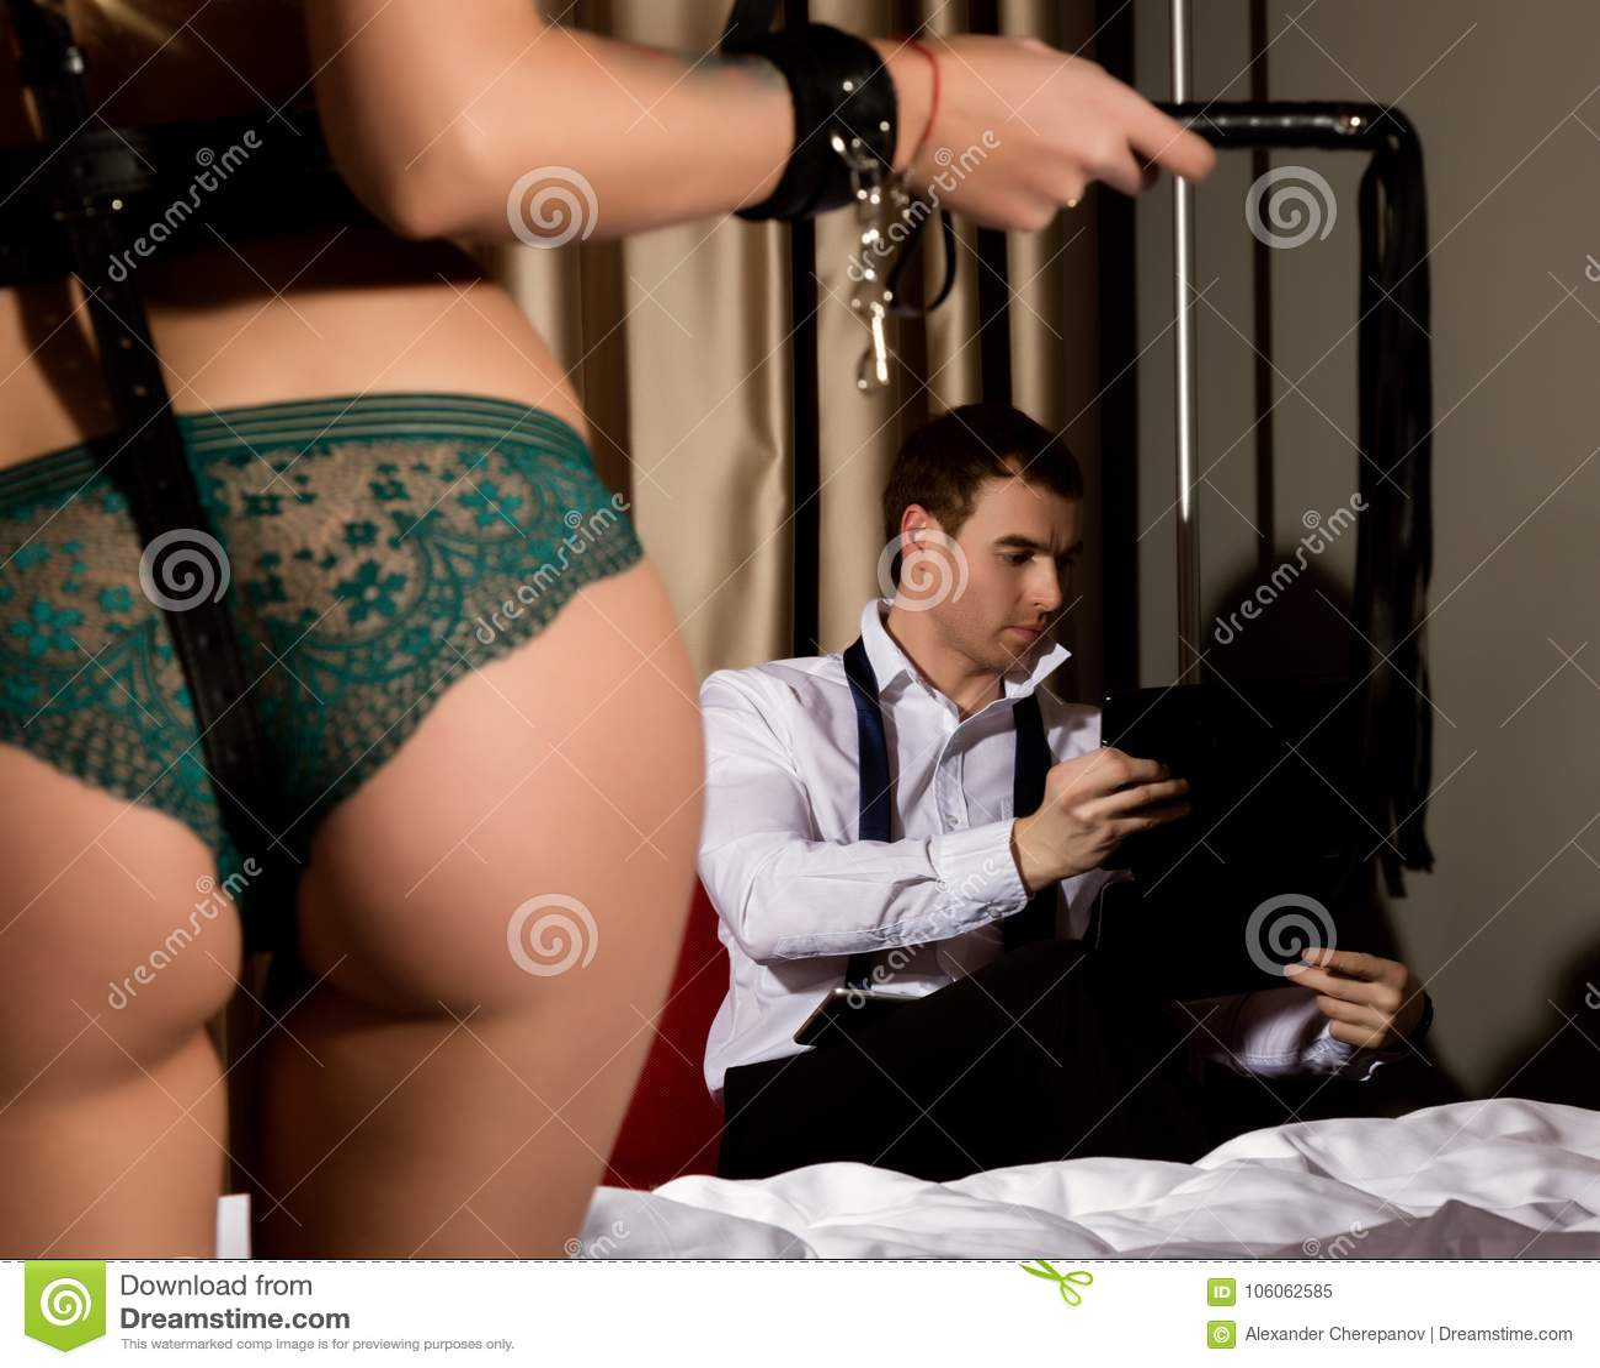 Anal free movie sex woman